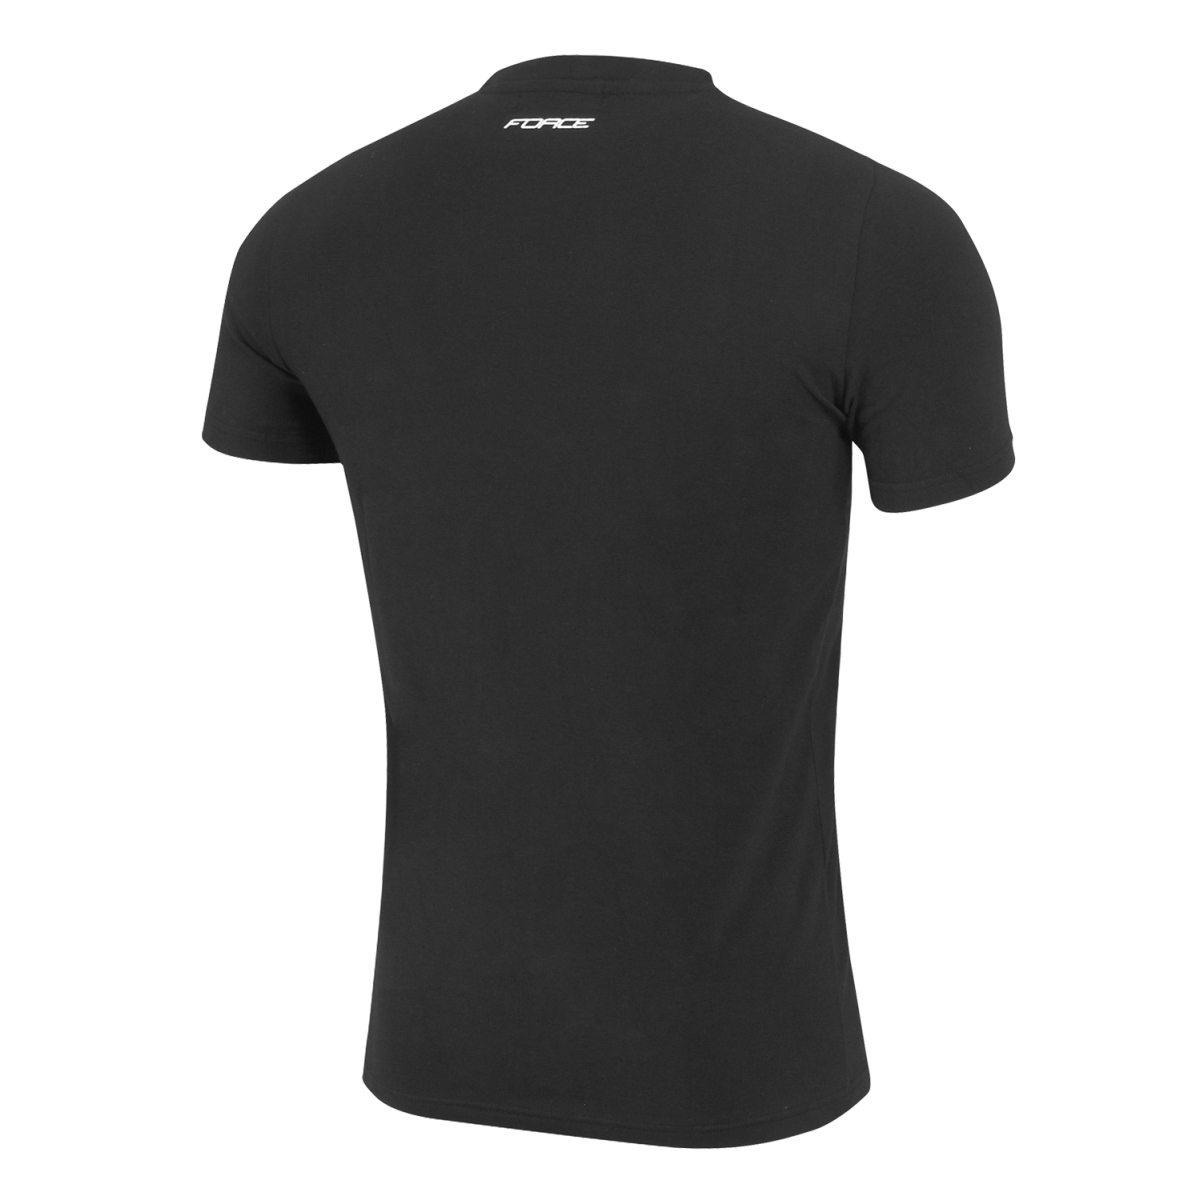 FORCE WORLD T-shirt